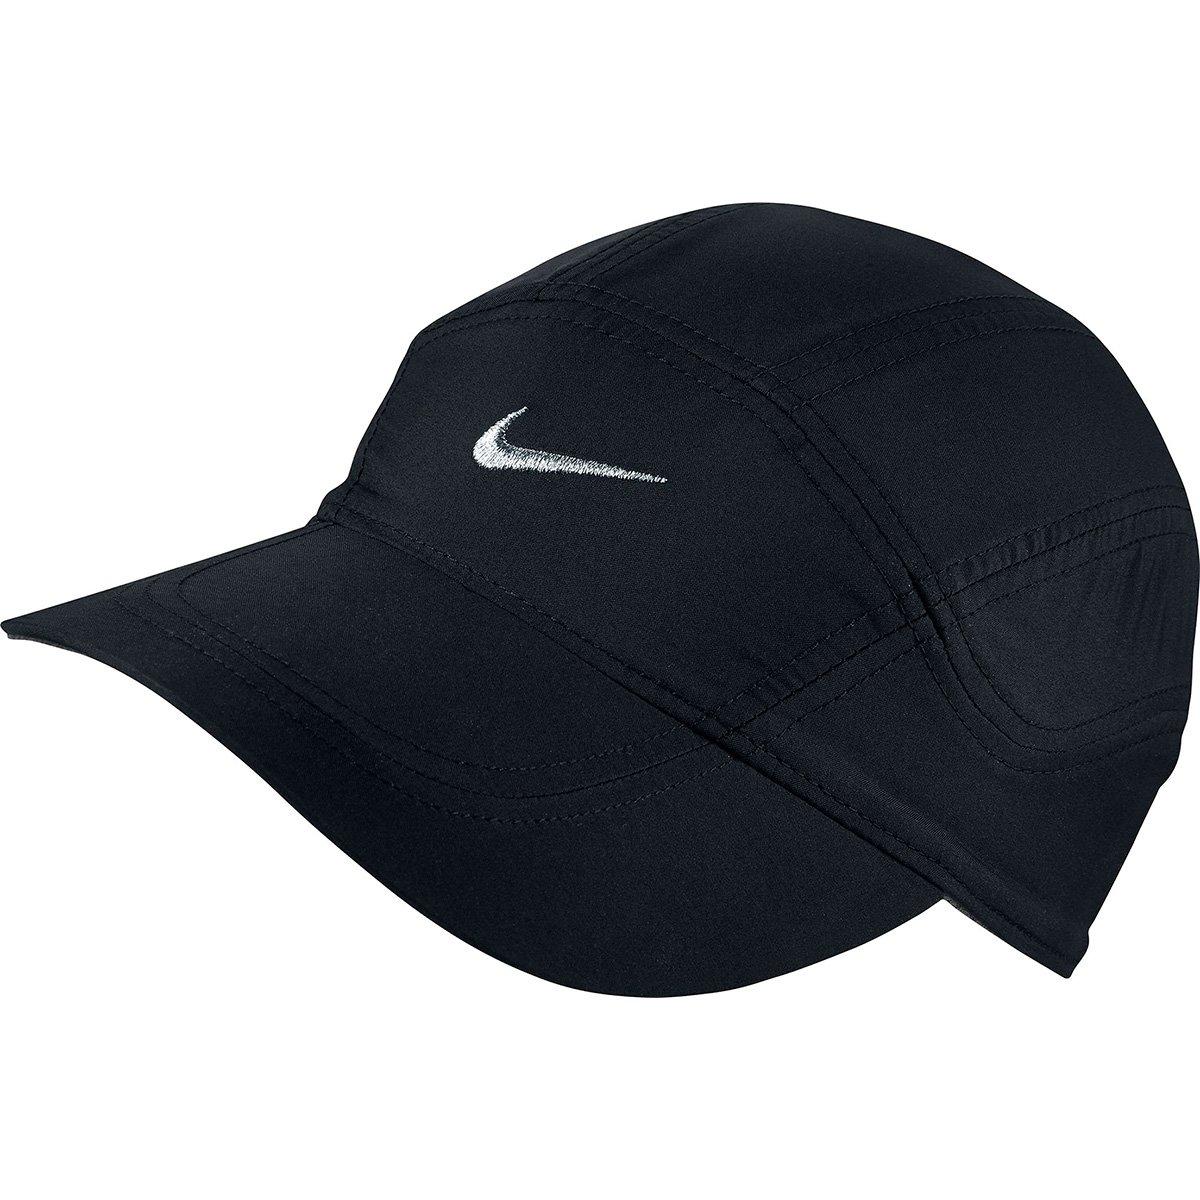 1c80a647c4b1d Boné Nike Aba Curva Dri-Fit Spiros - Compre Agora